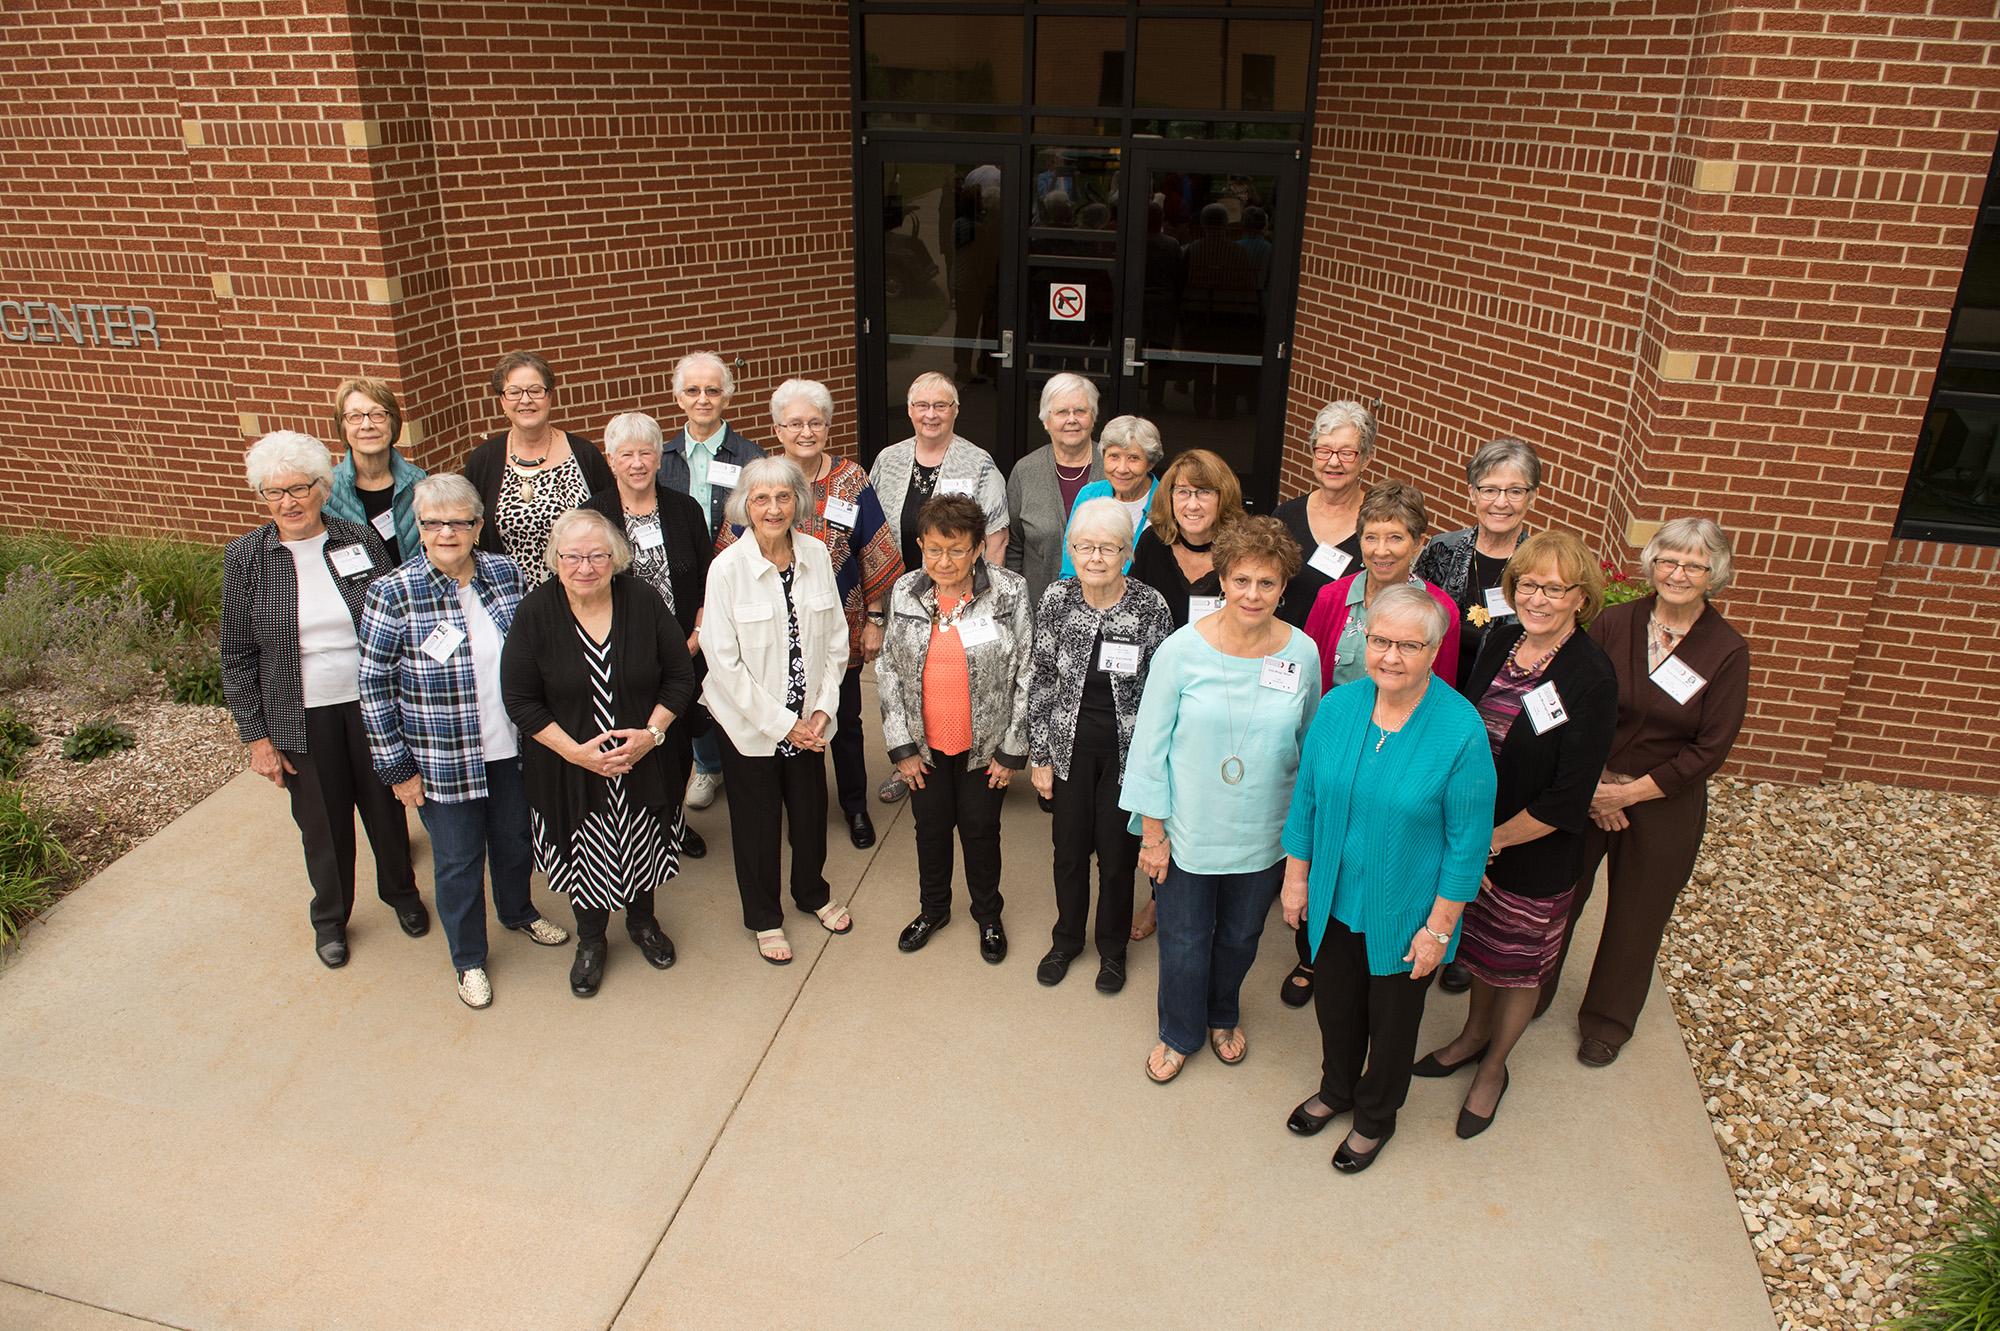 Hesston College - Kansas City General Hospital nursing alumni gather for a photo.